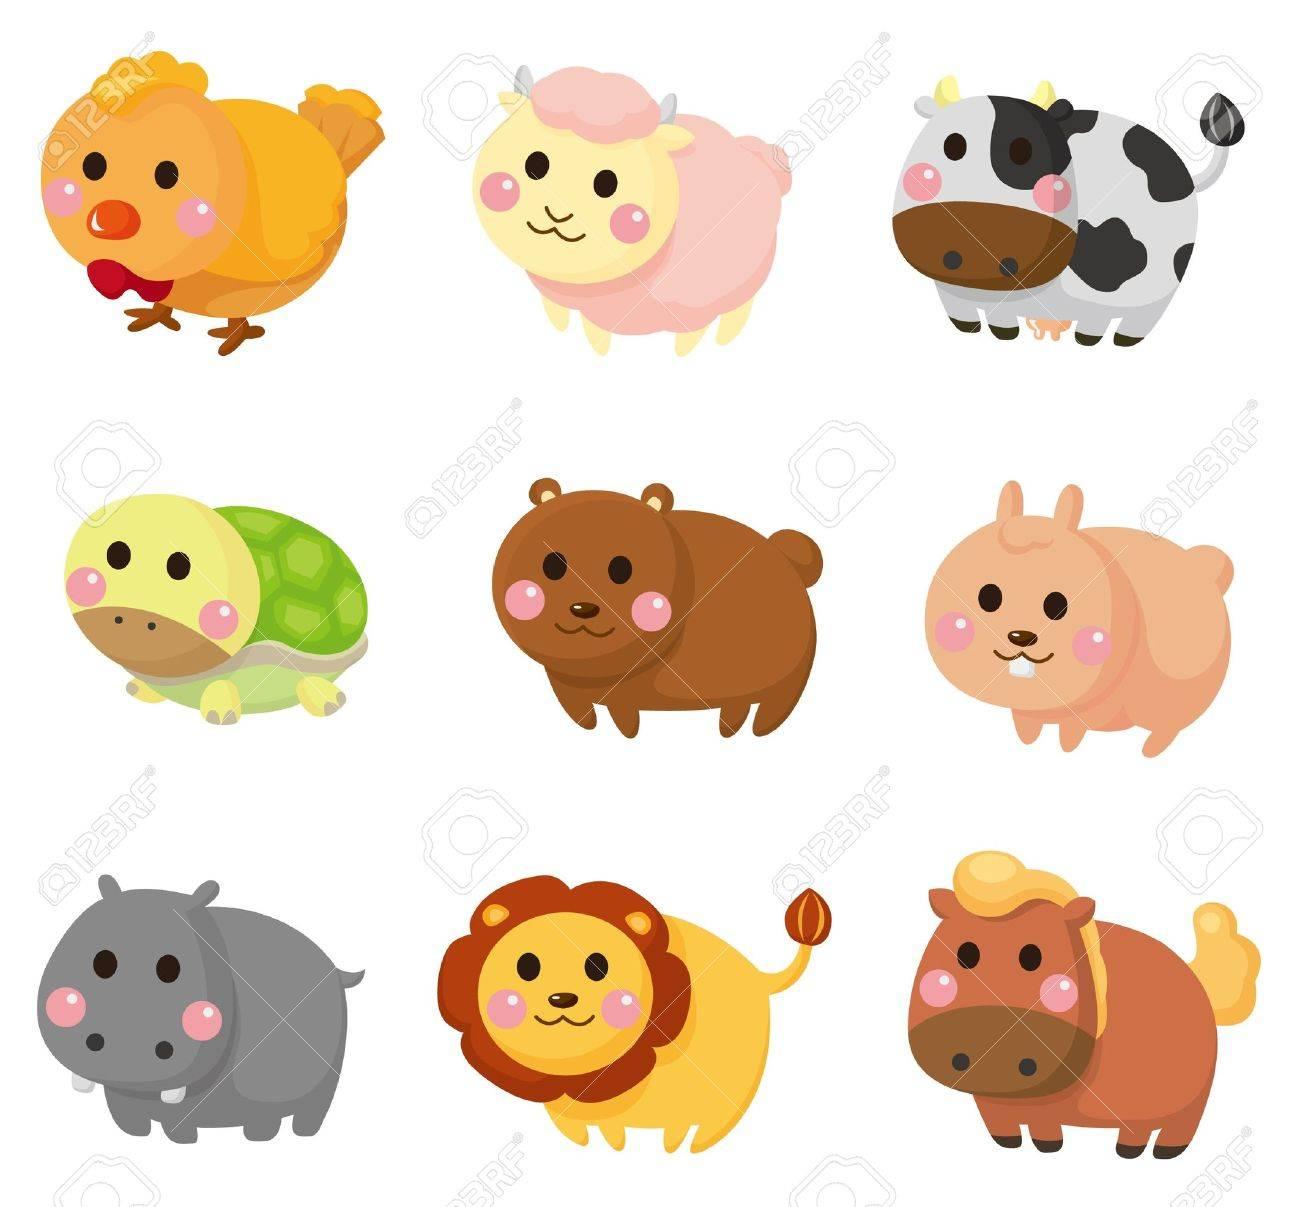 cartoon animal icon set Stock Vector - 9635583